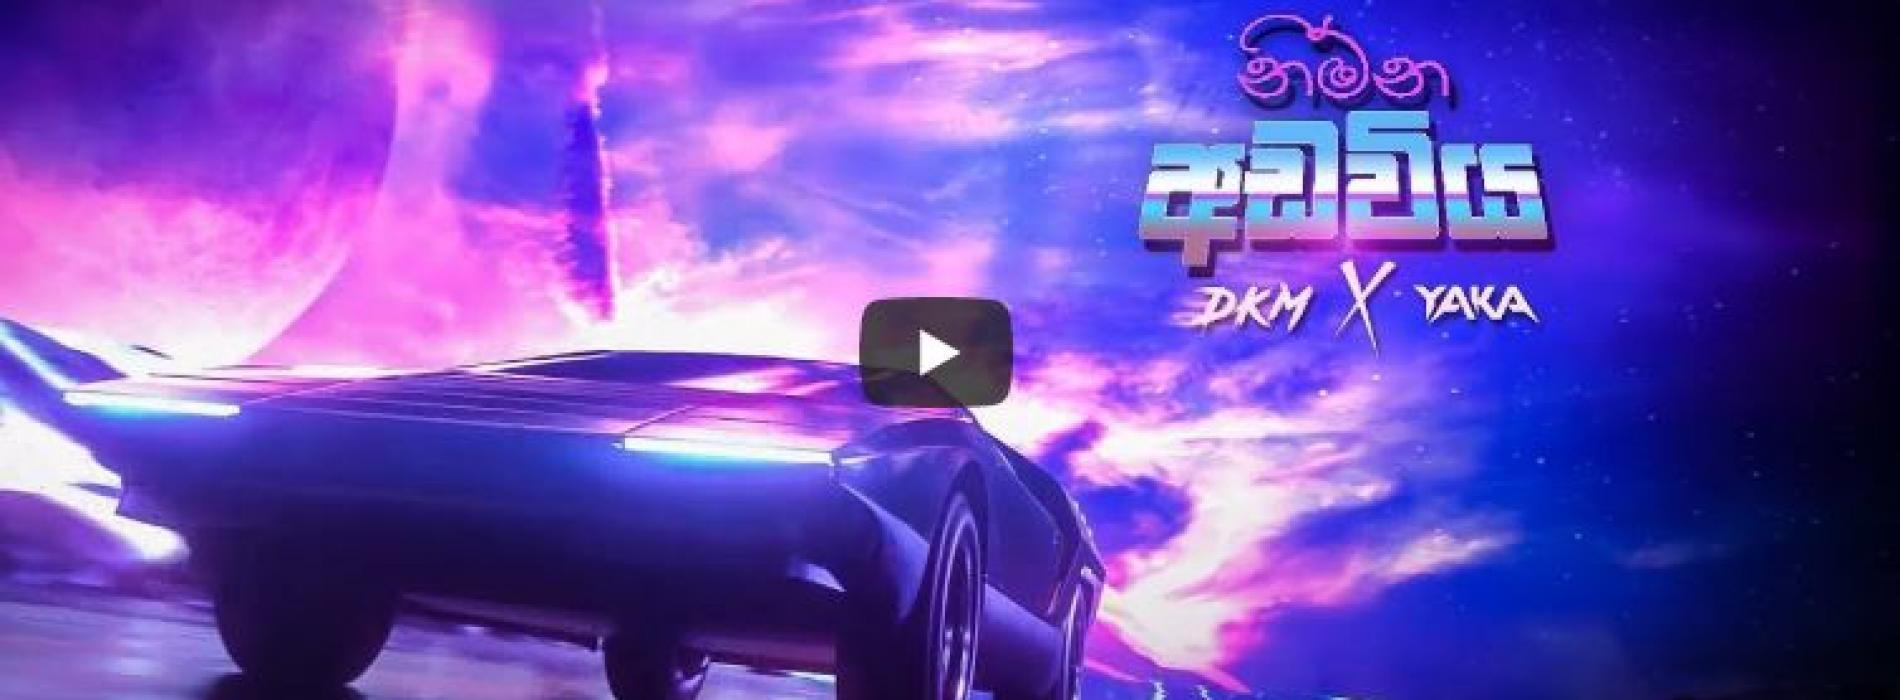 Nimna Adaviya (නිම්න අඩවිය) – DKM x YAKA (Official Lyric Video)